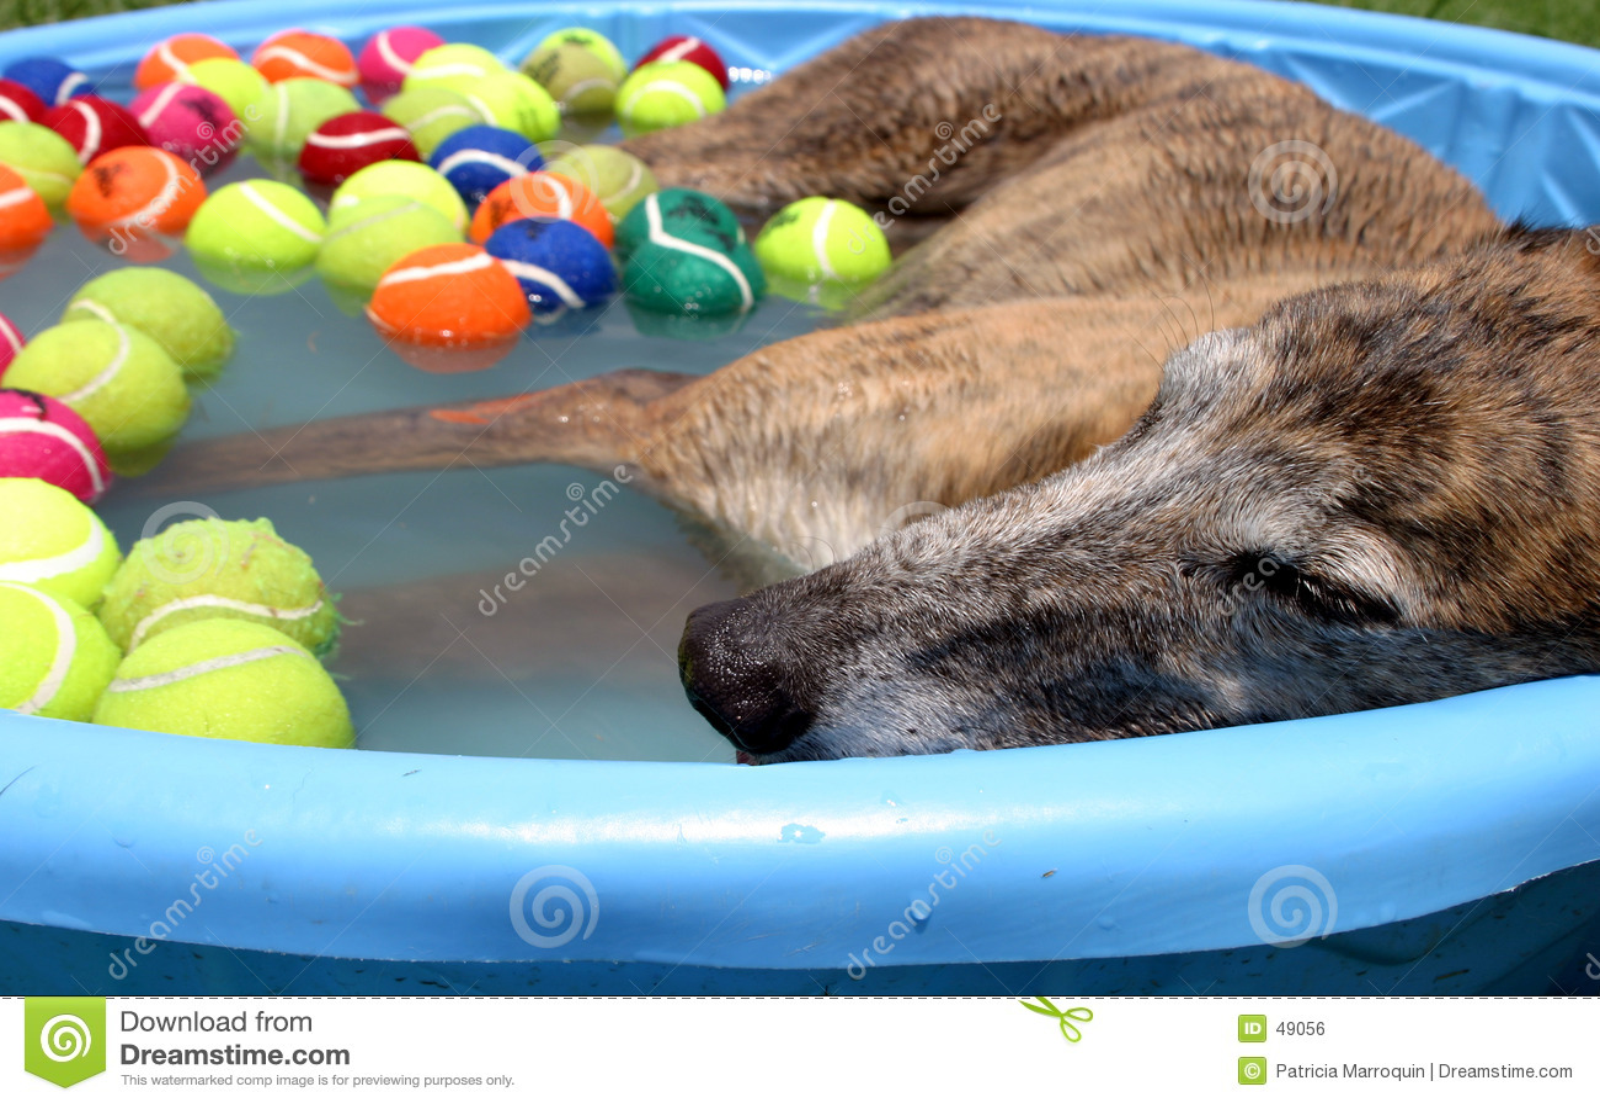 Po południu dnia pies